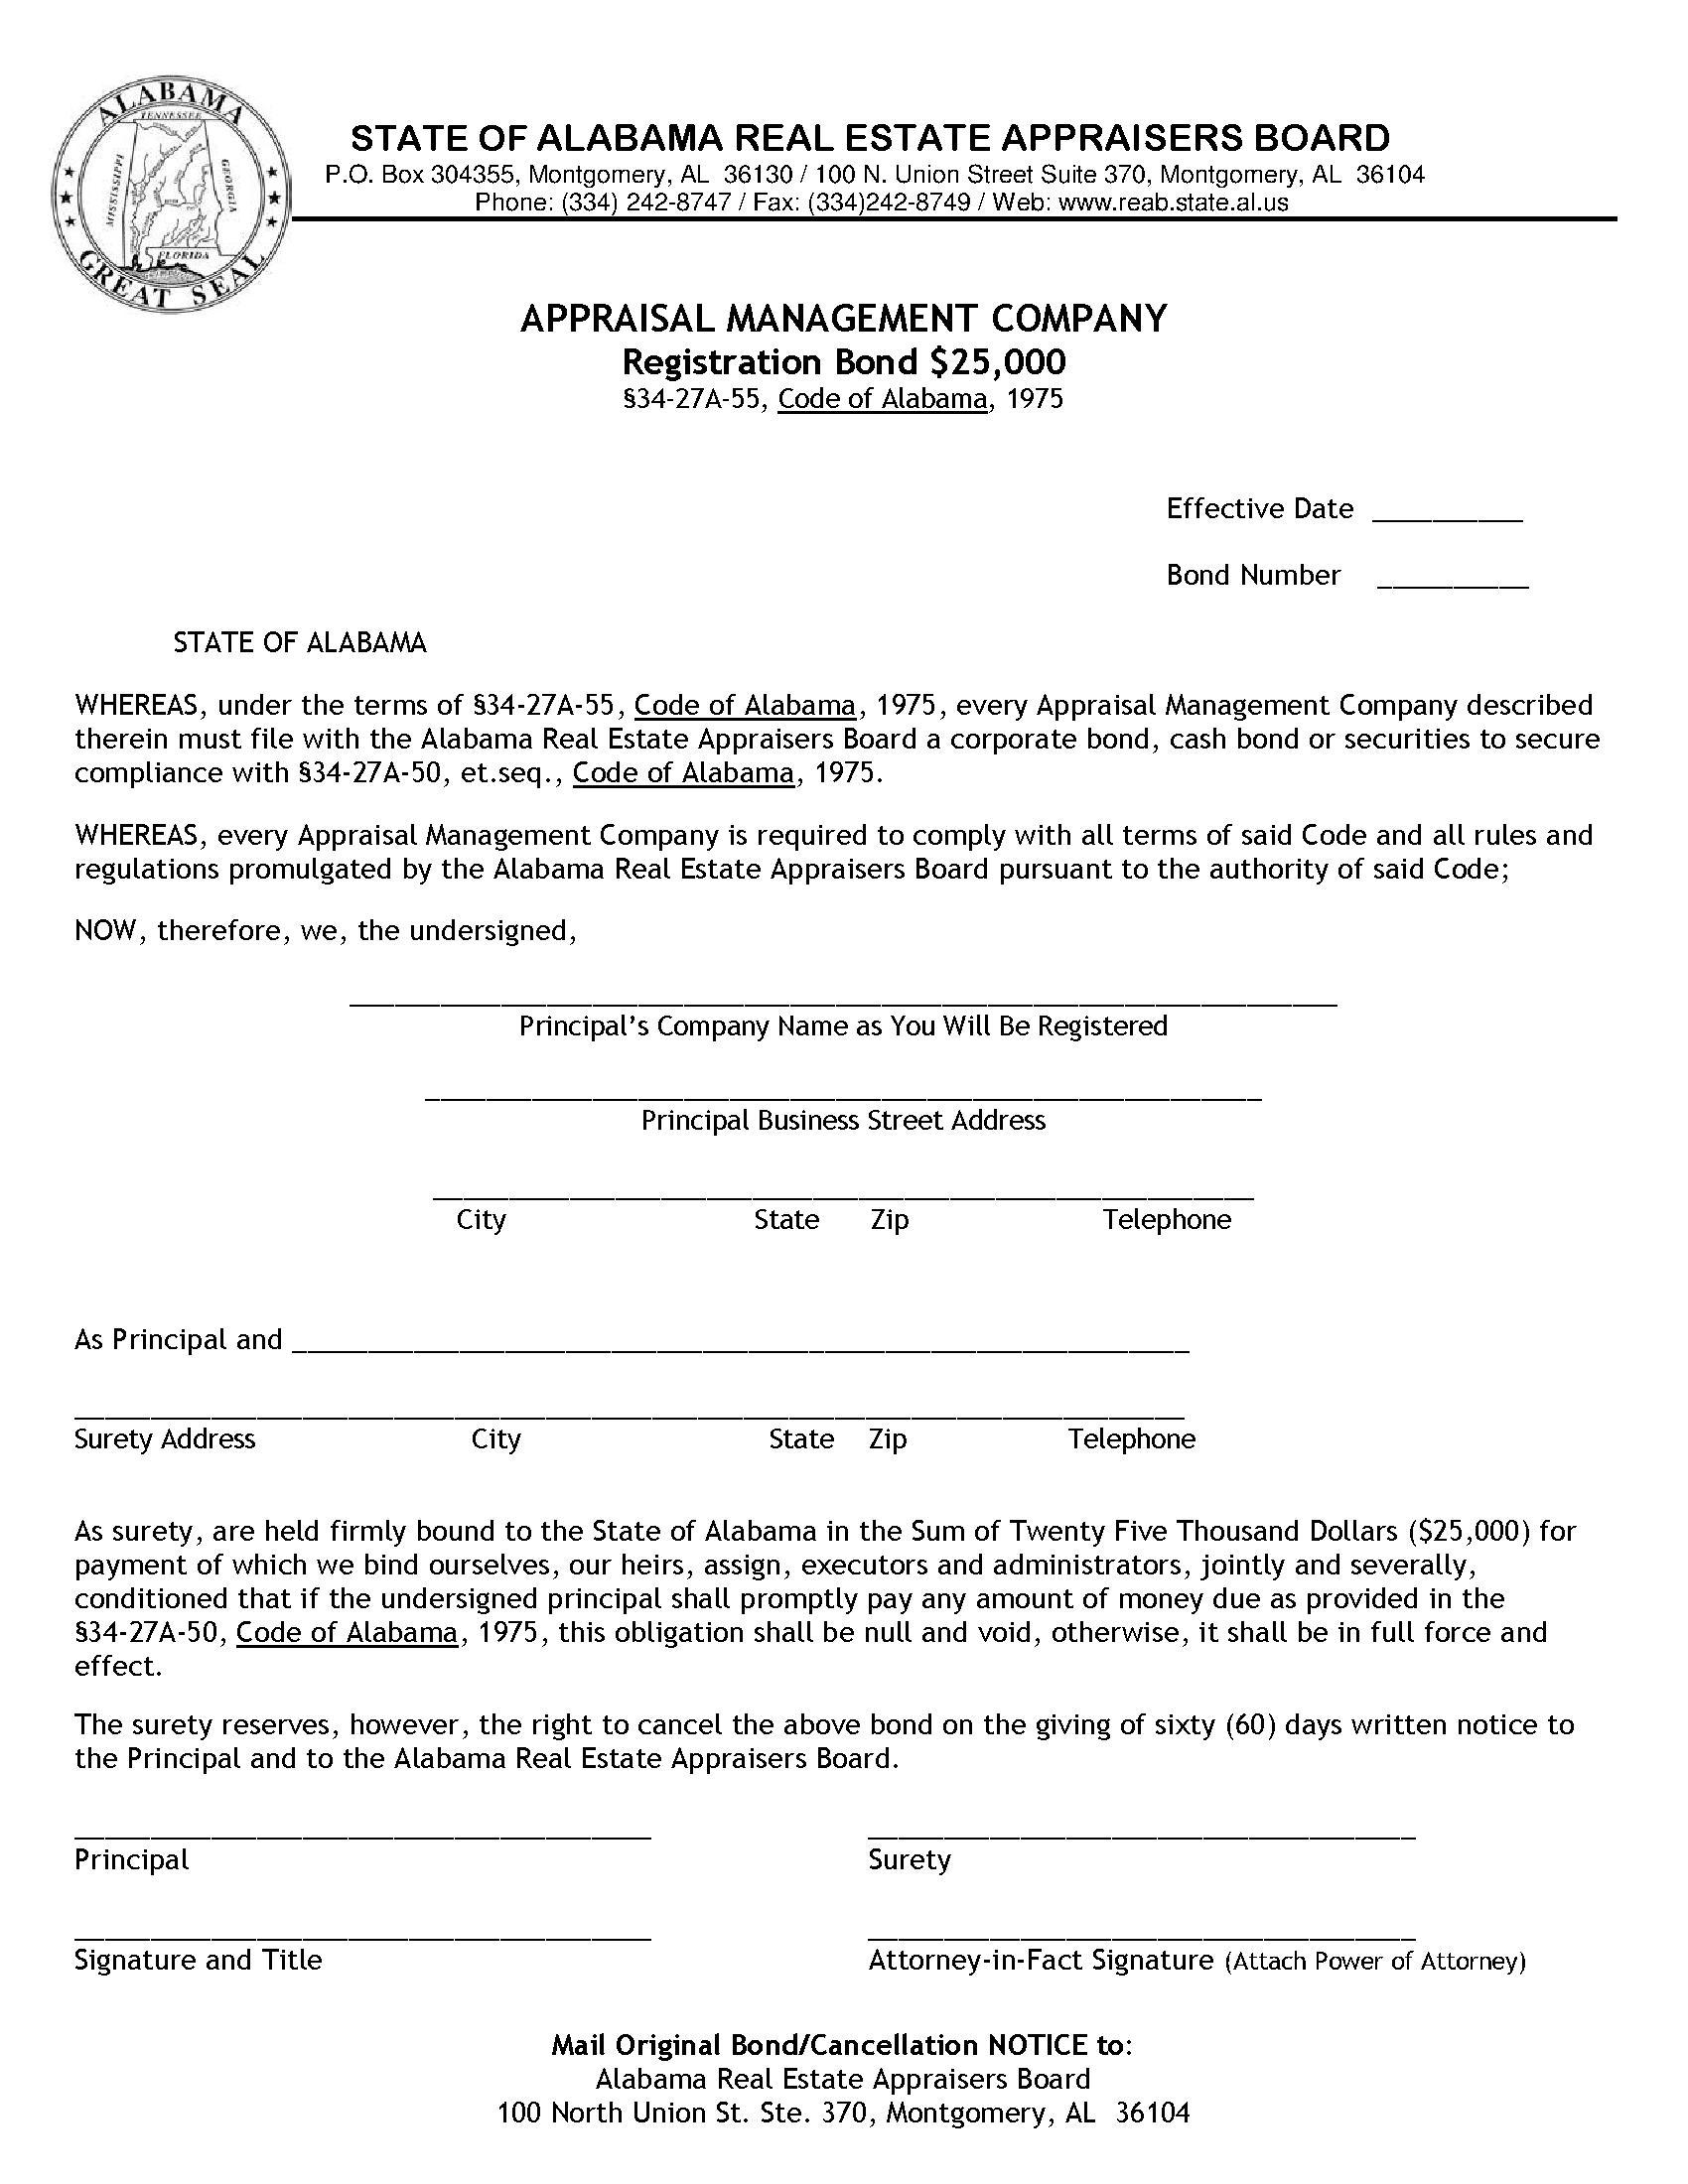 State of Alabama Appraisal Management Company Bond sample image